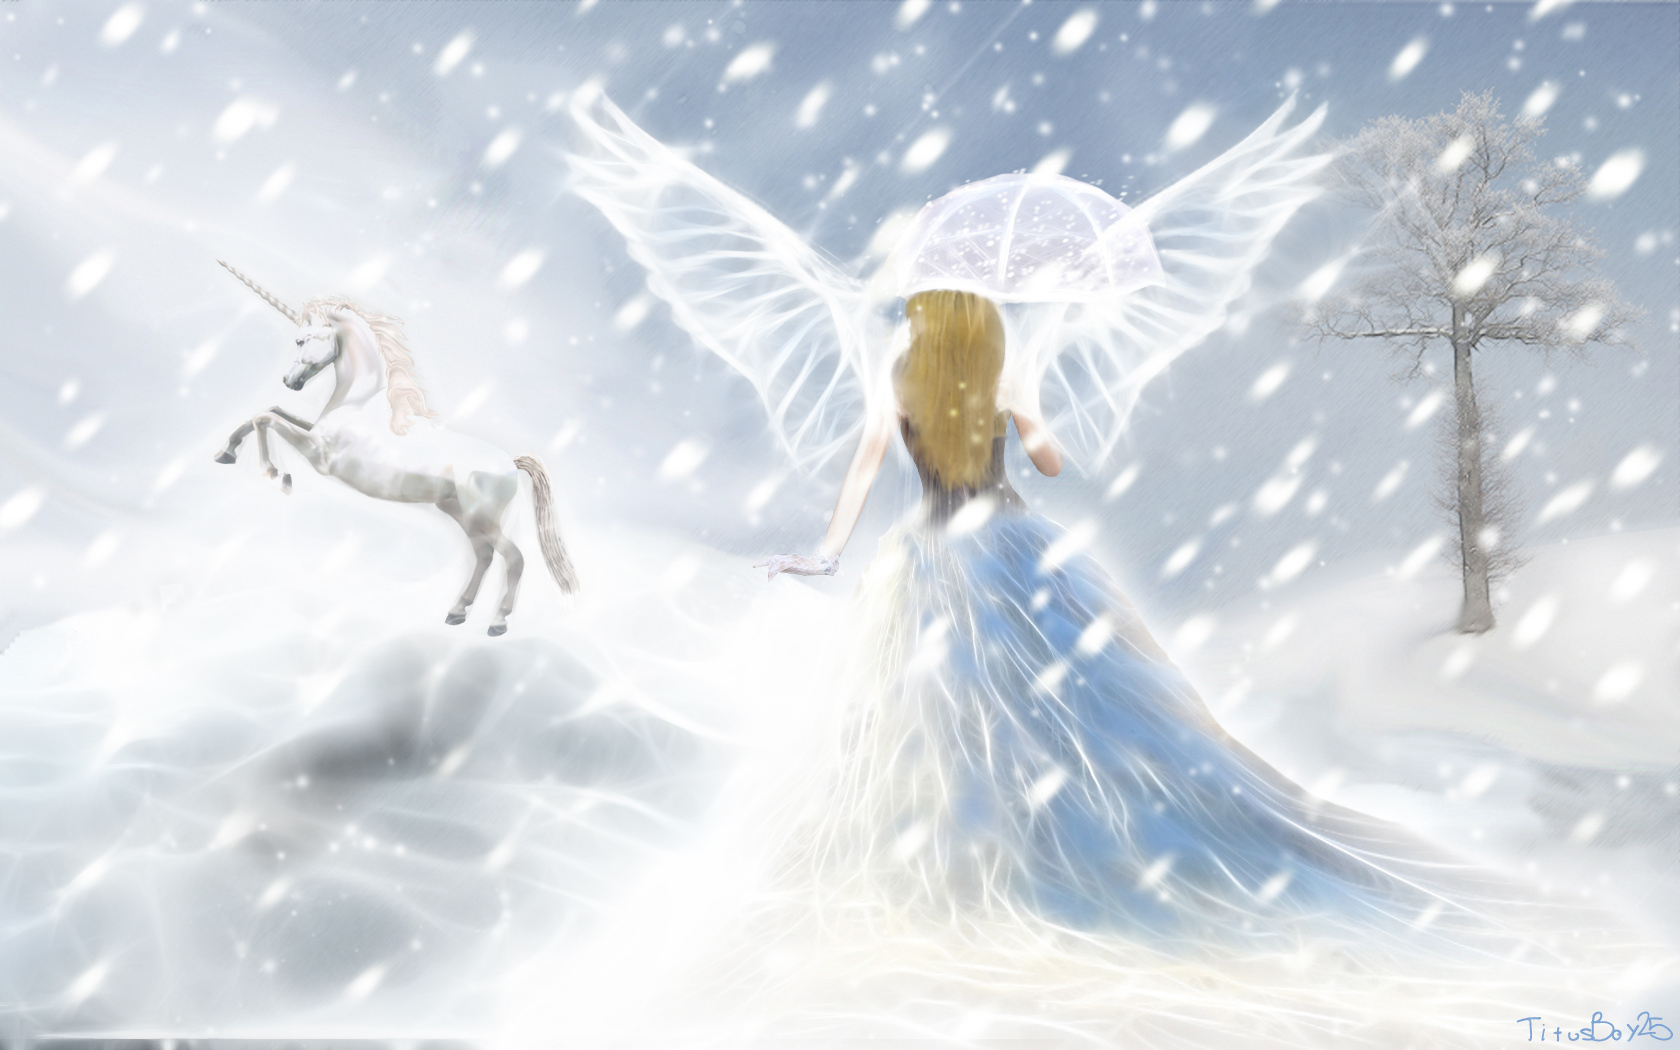 Abstract Animal Wallpaper Unicorn Horse Magical Animal Fairy Angel Mood G Wallpaper